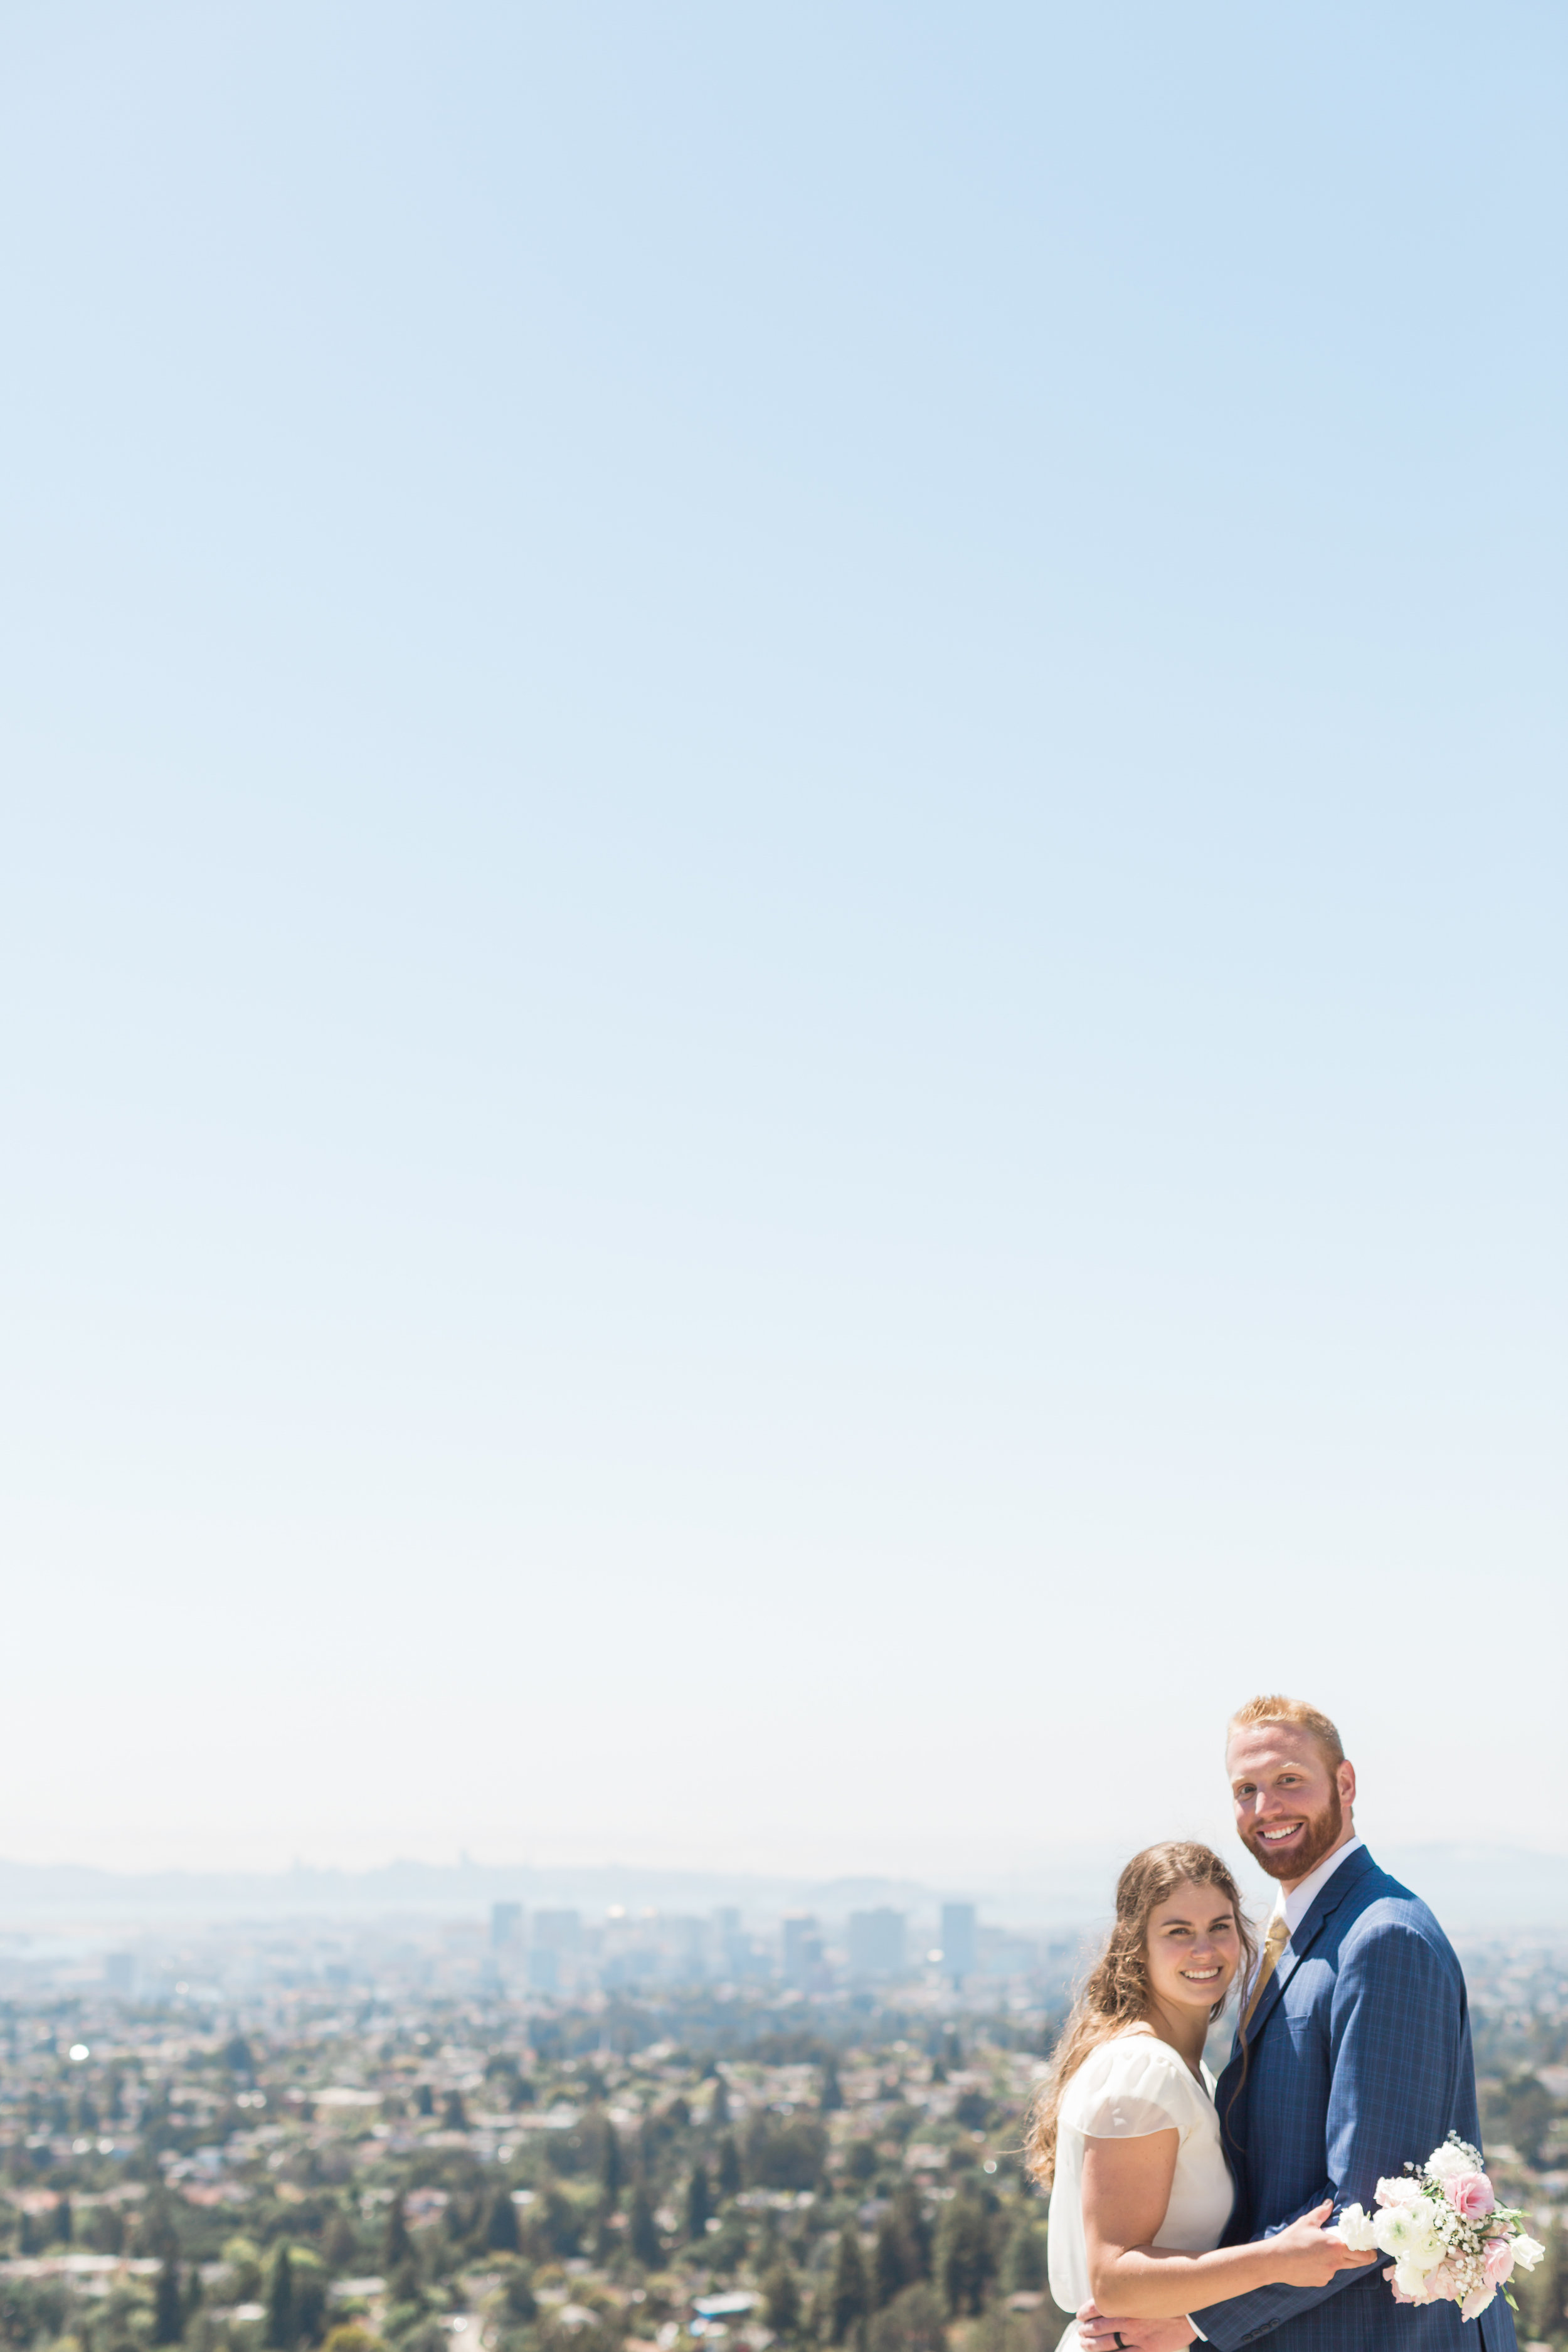 oakland-temple-wedding-bride-groom.jpg